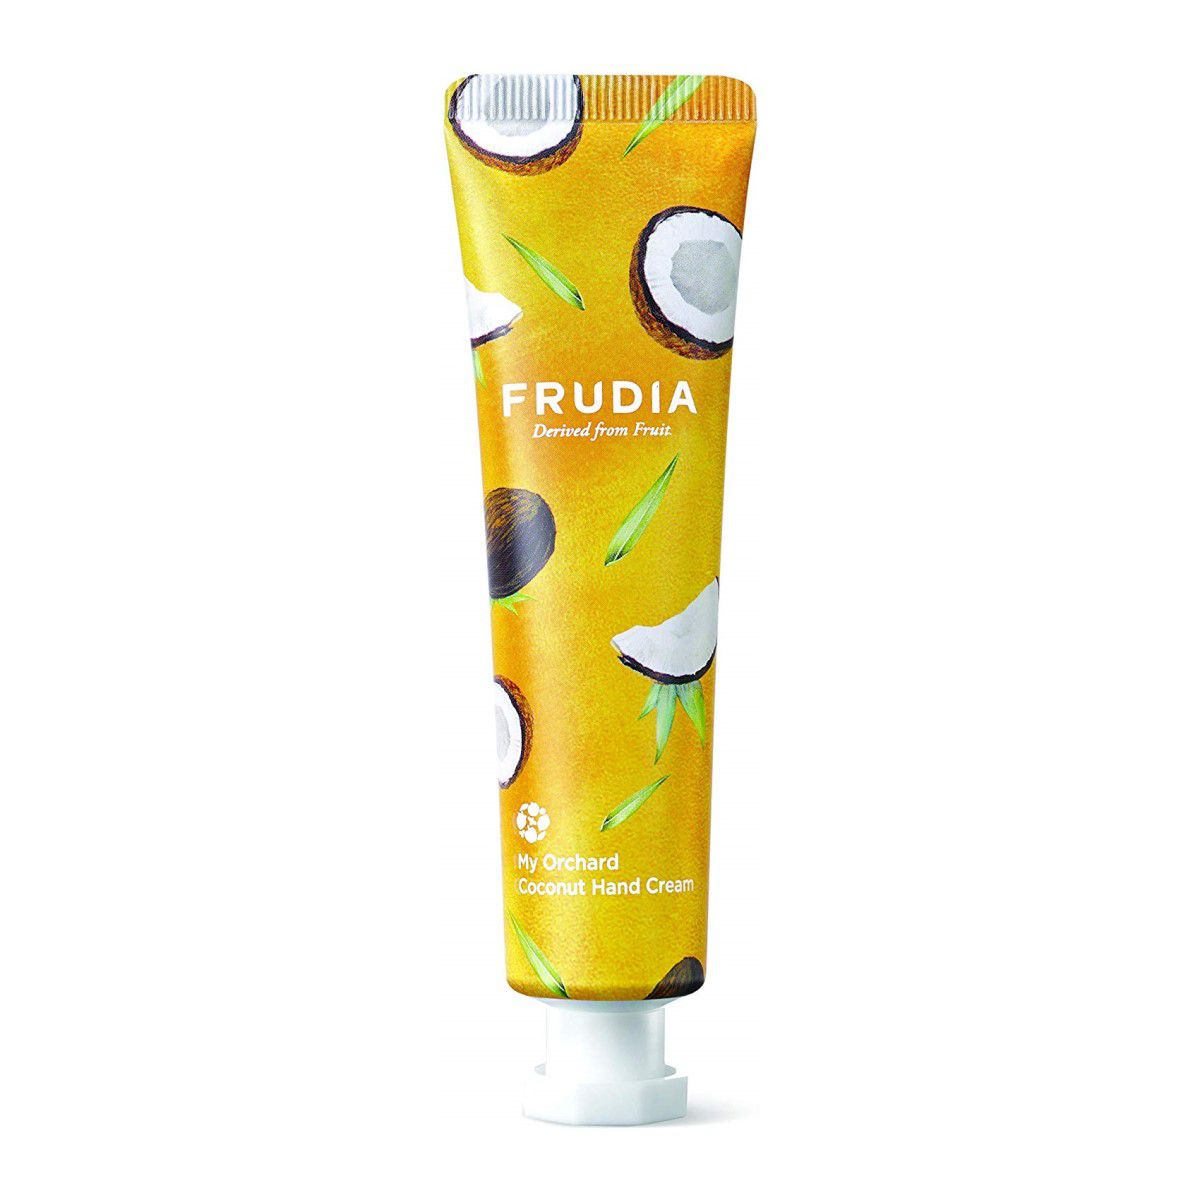 FRUDIA My Orchard Coconut Hand Creamのバリエーション4